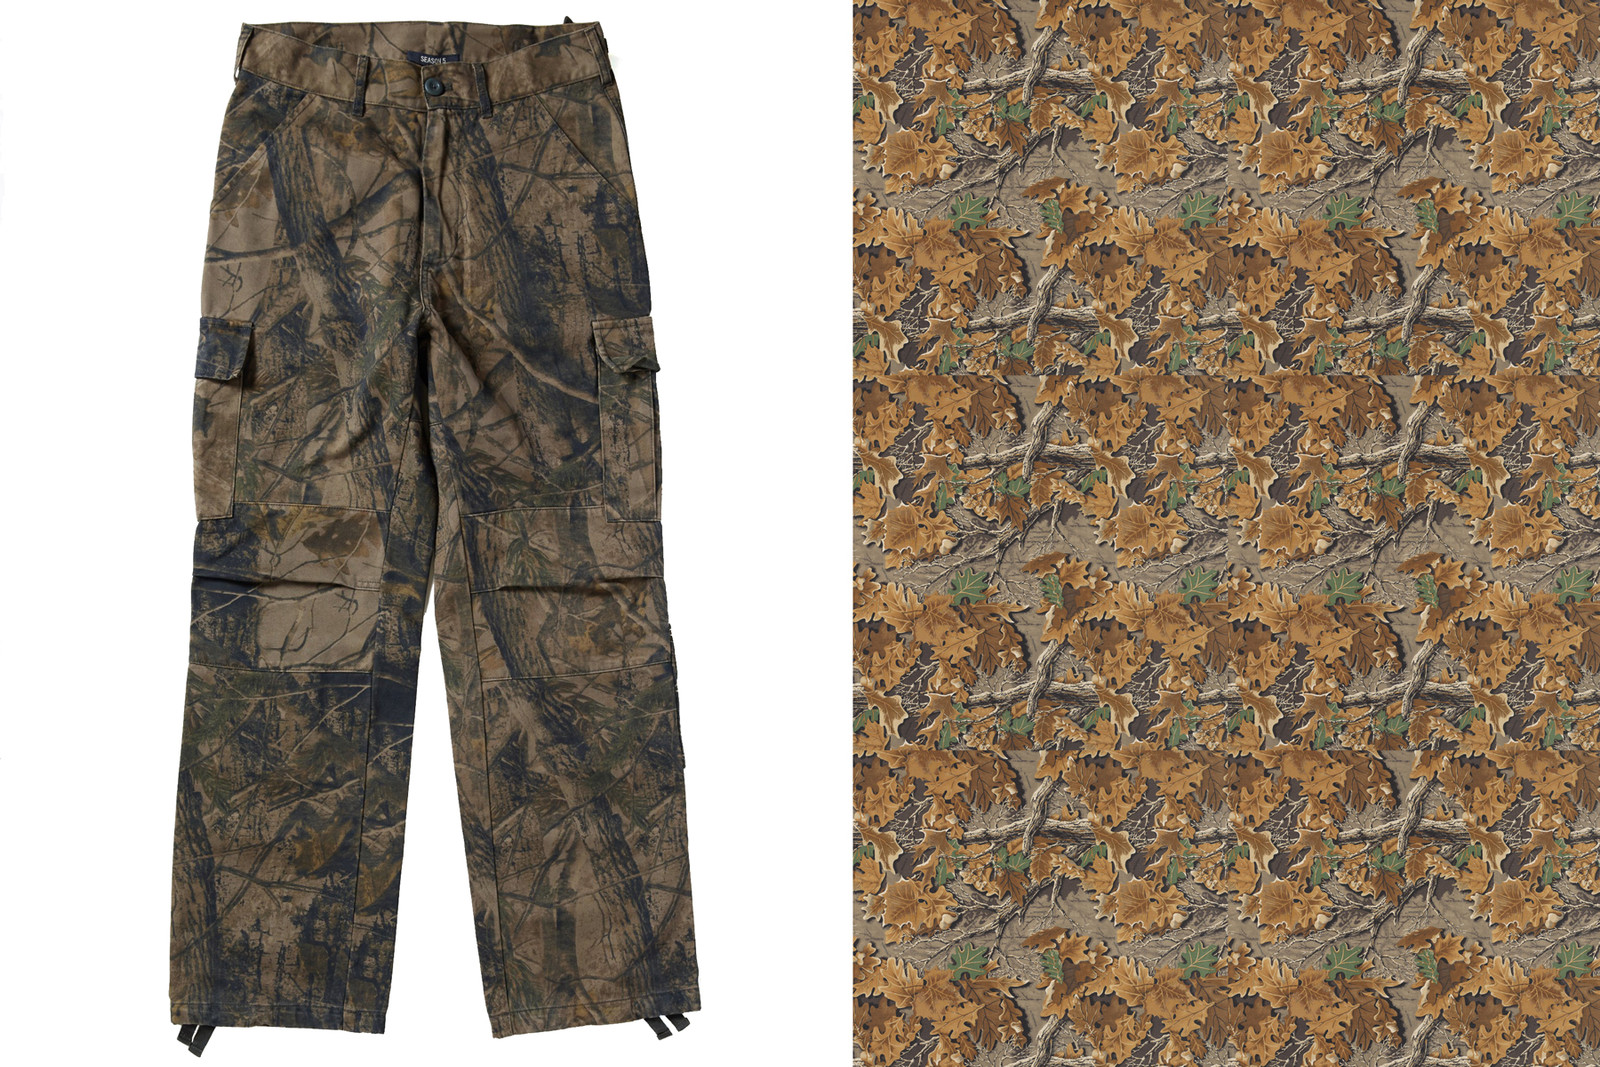 YEEZY Kanye West Lebron James Jordan Outdoor Enterprises ltd Camouflage pattern rip off copy steal lawsuit unknwn copyright infringement